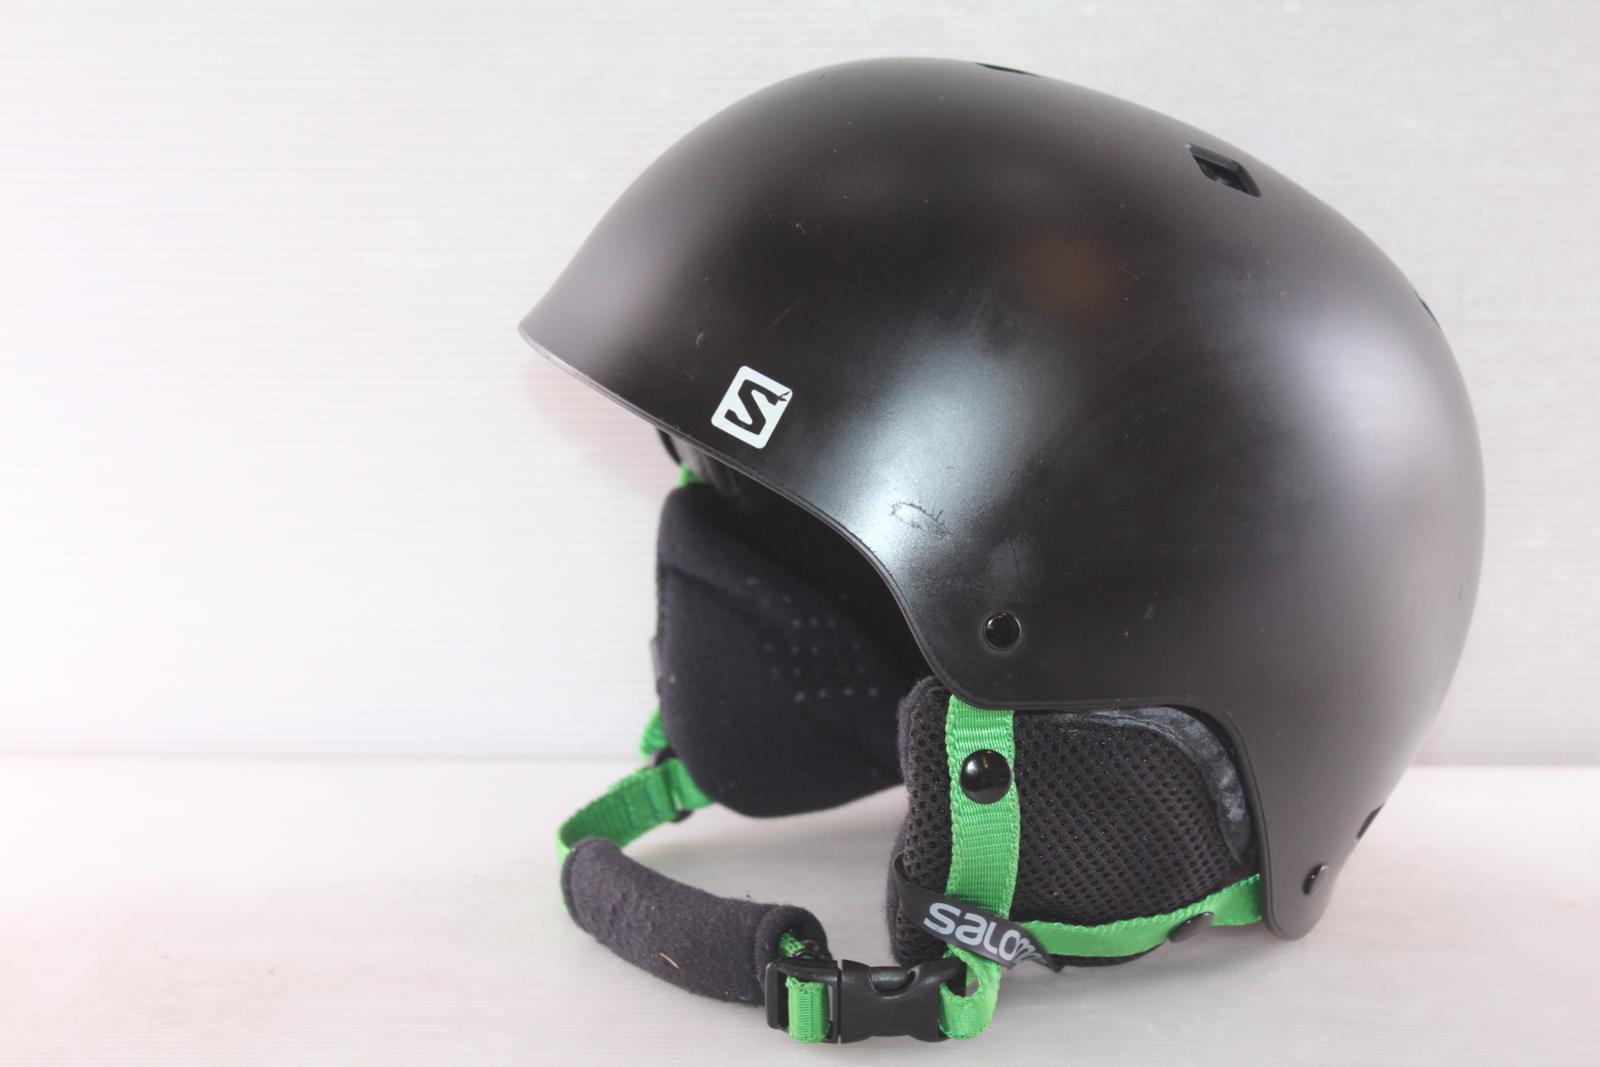 Lyžařská helma Salomon Green - posuvná vel. 55 - 58